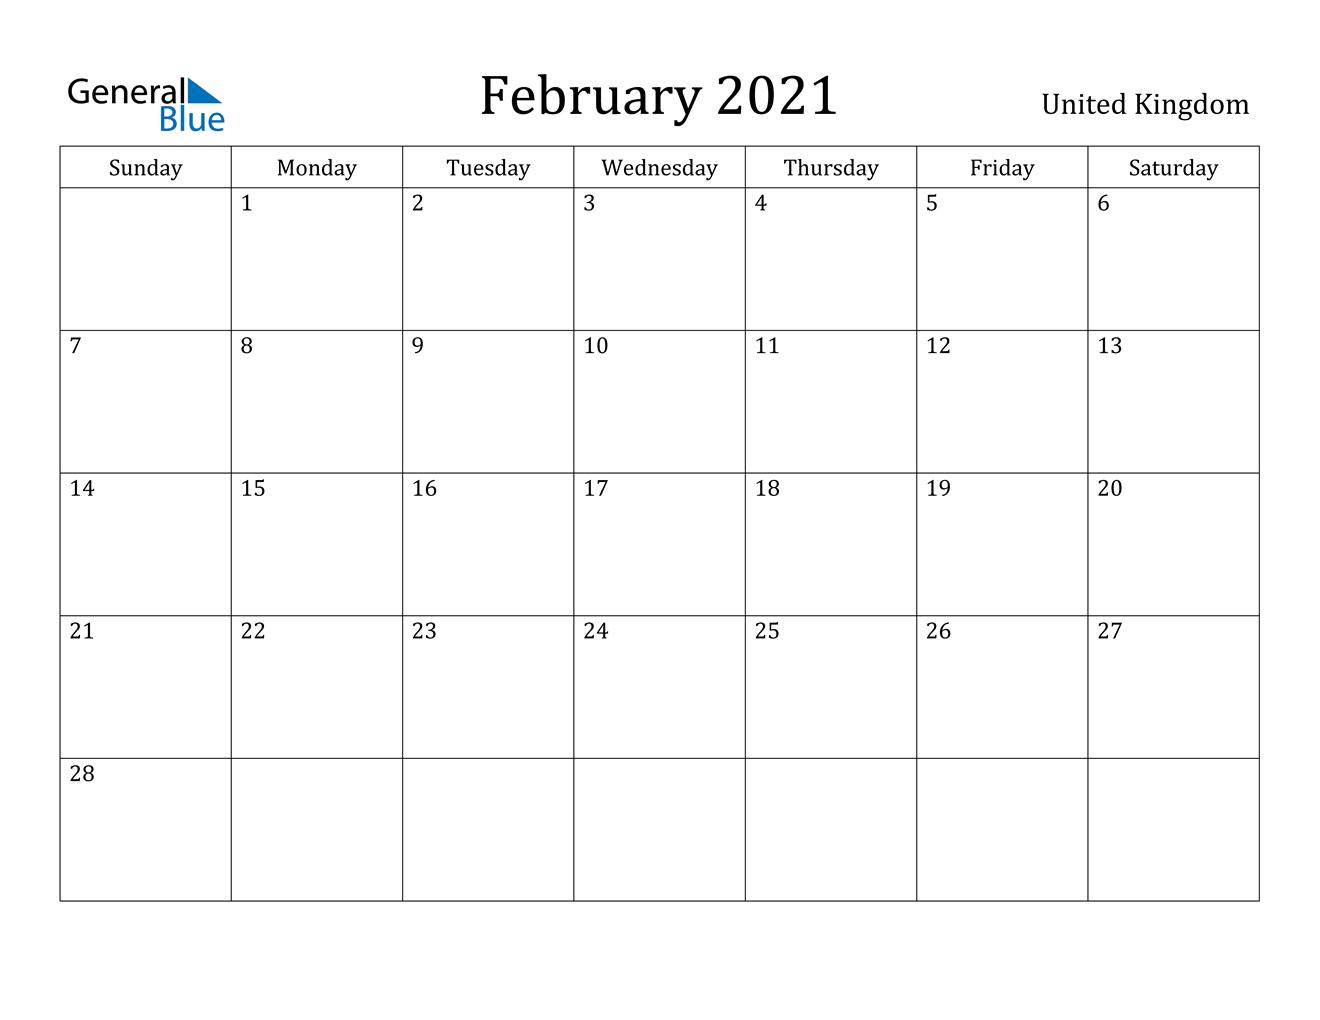 February 2021 Calendar - United Kingdom